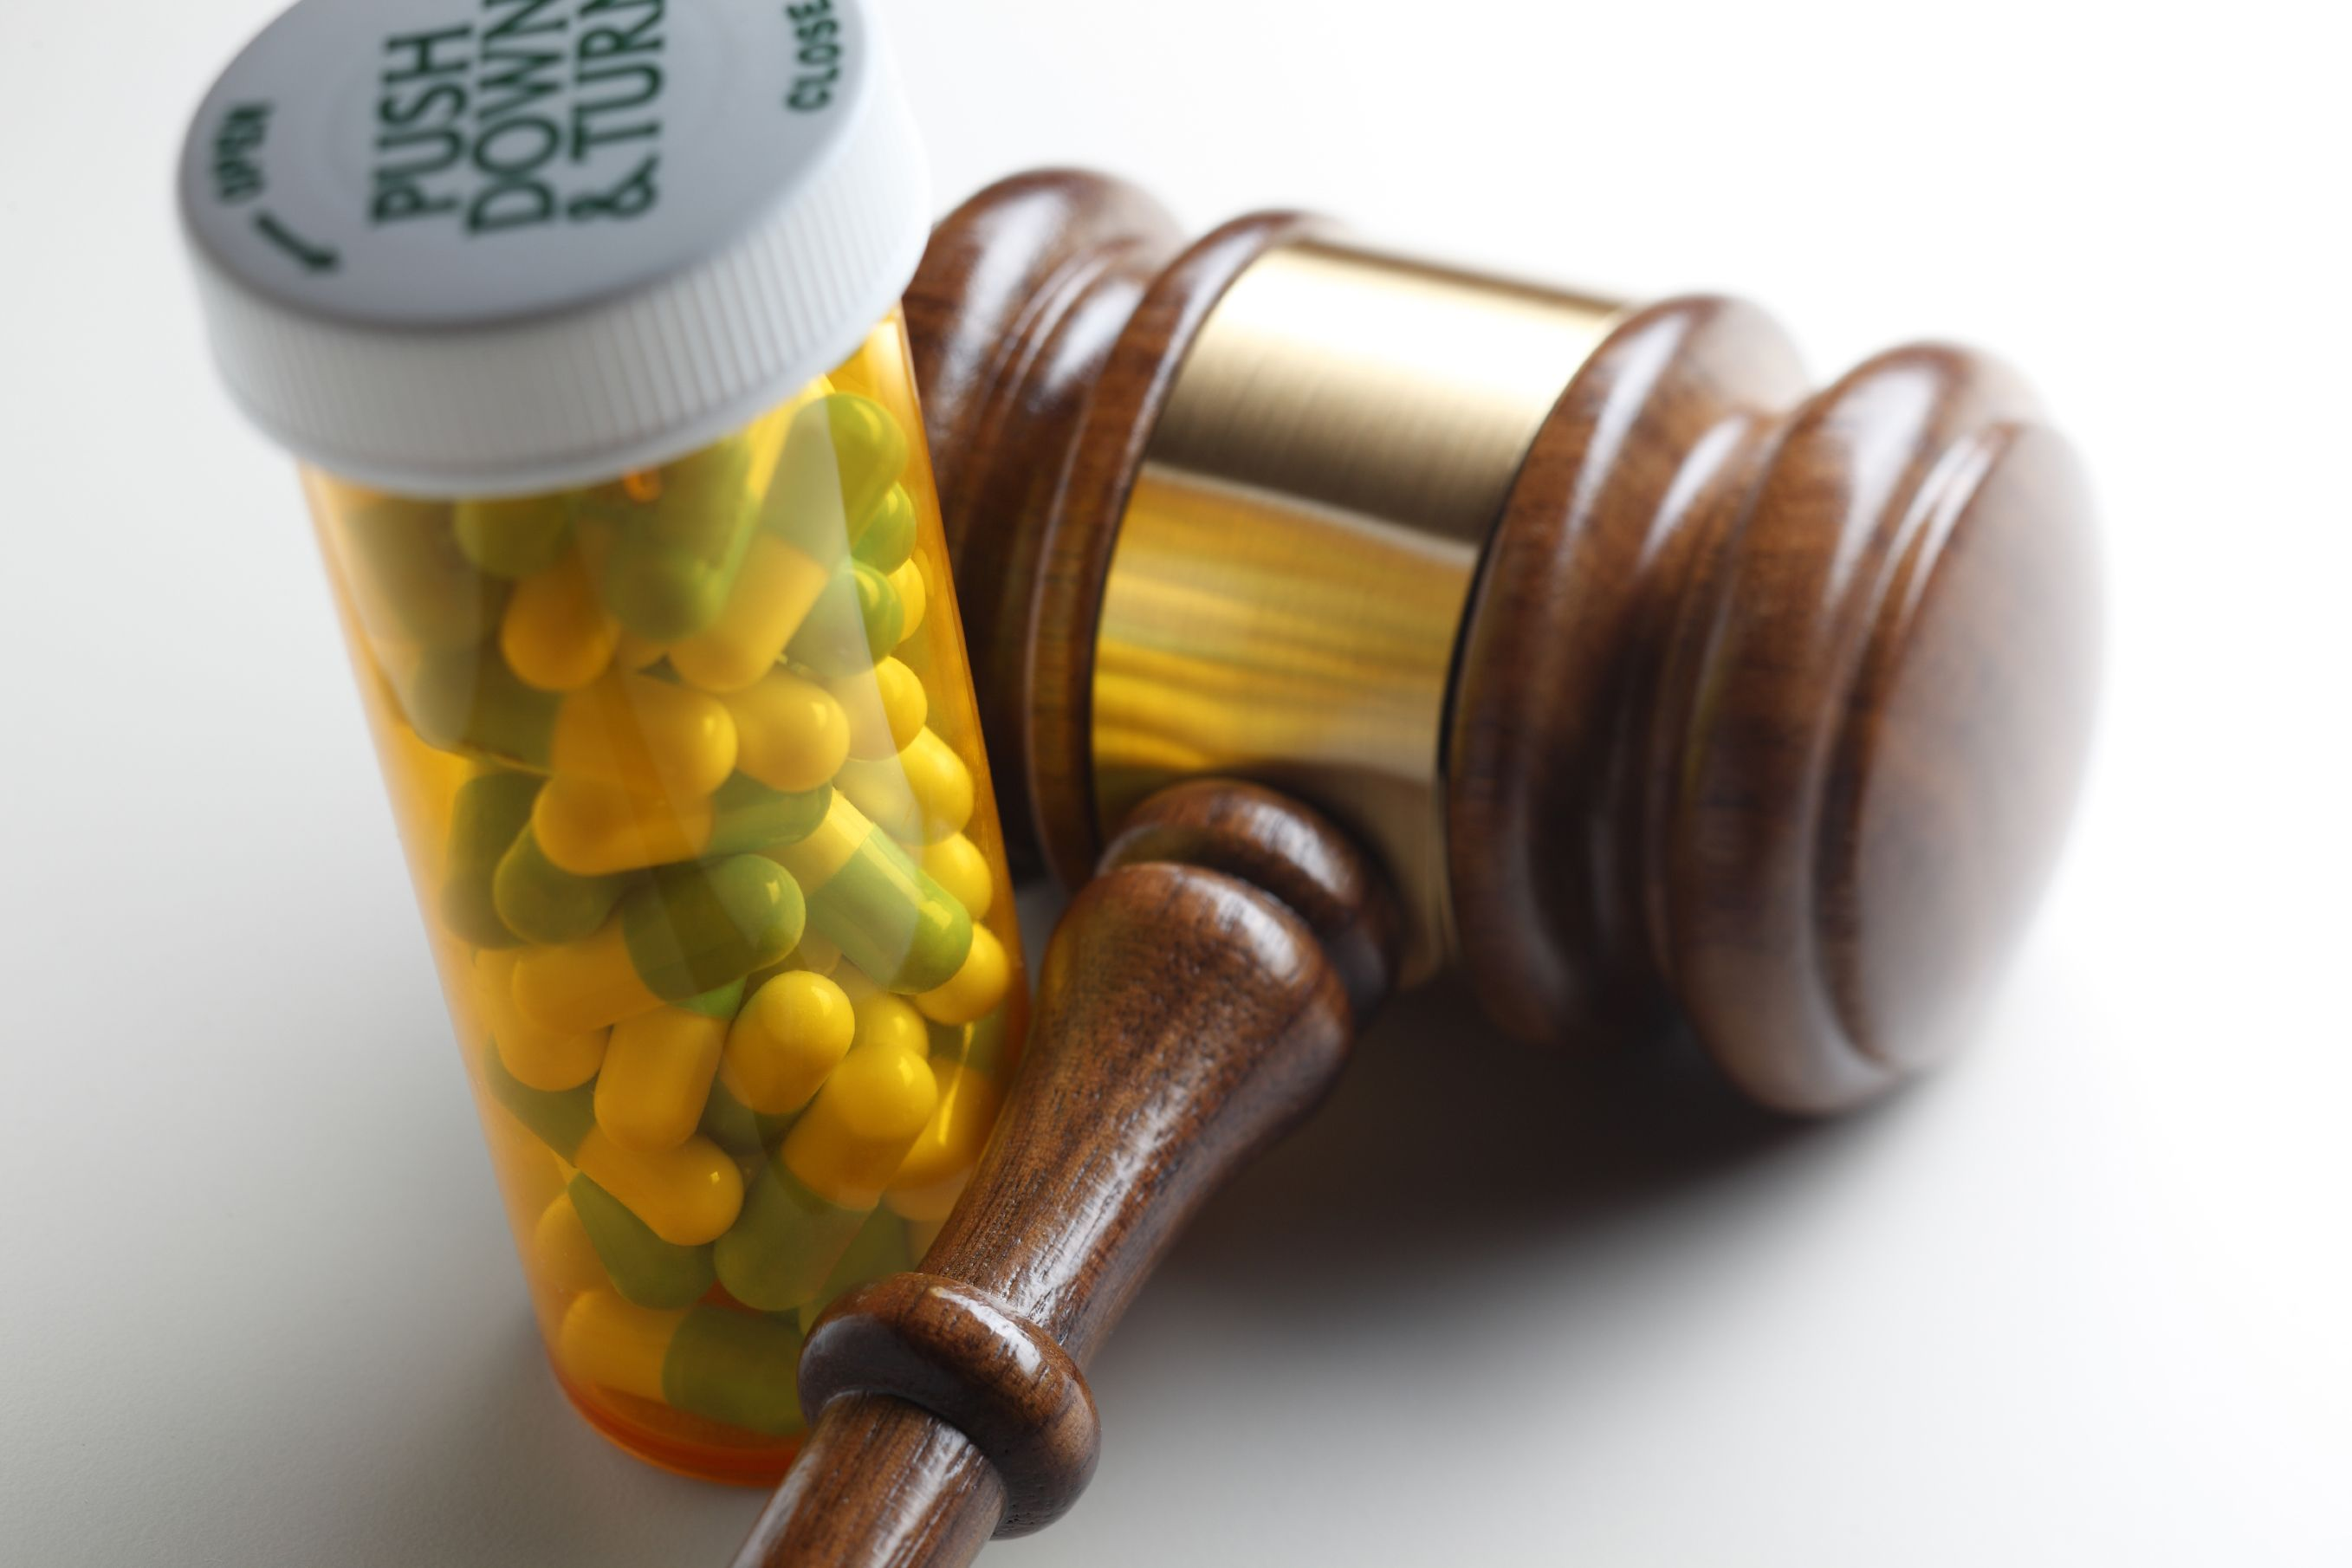 Prescription medication next to a judge's gavel